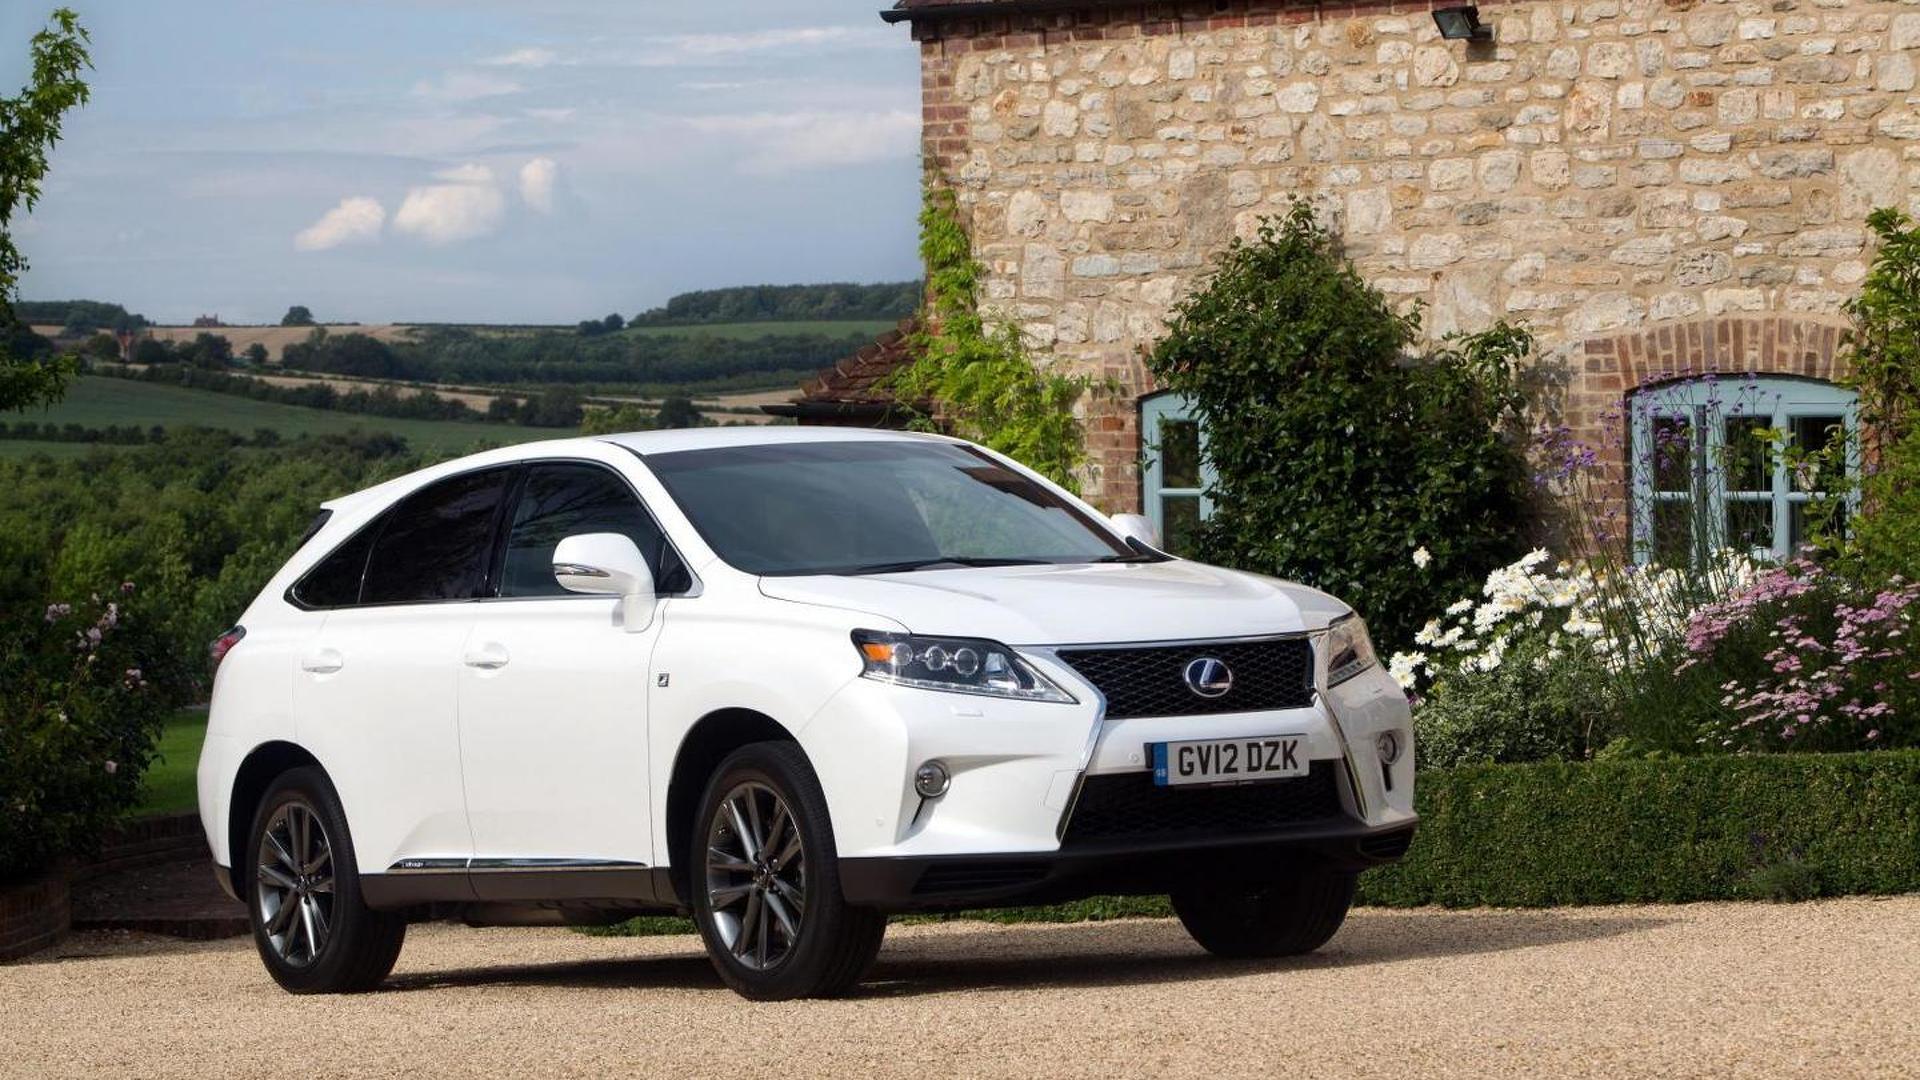 rx qatar living img lexus vehicles title